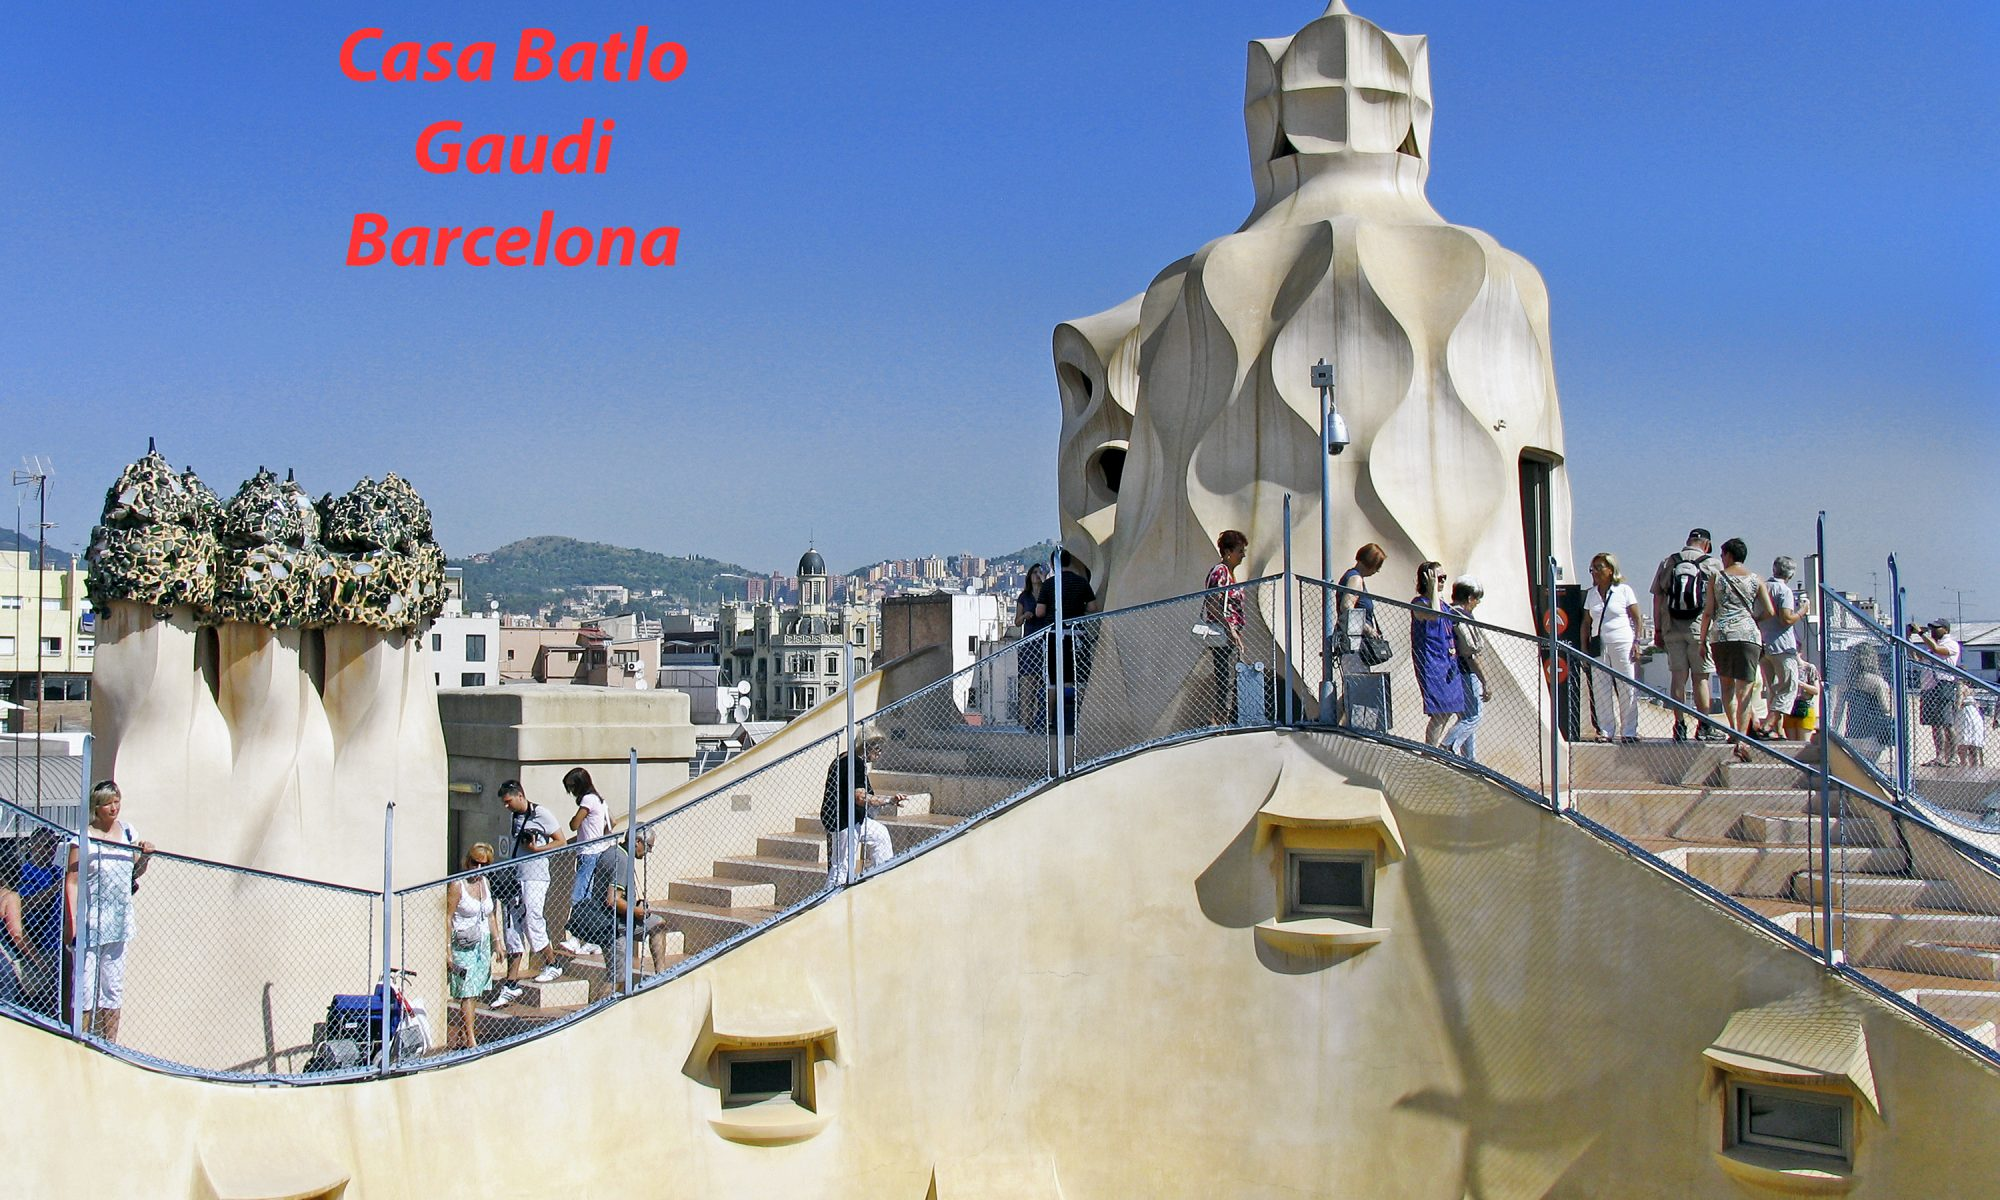 Casa Batlló, a building designed by Gaudí in Barcelona. (Dr. Noorali Bharwani)